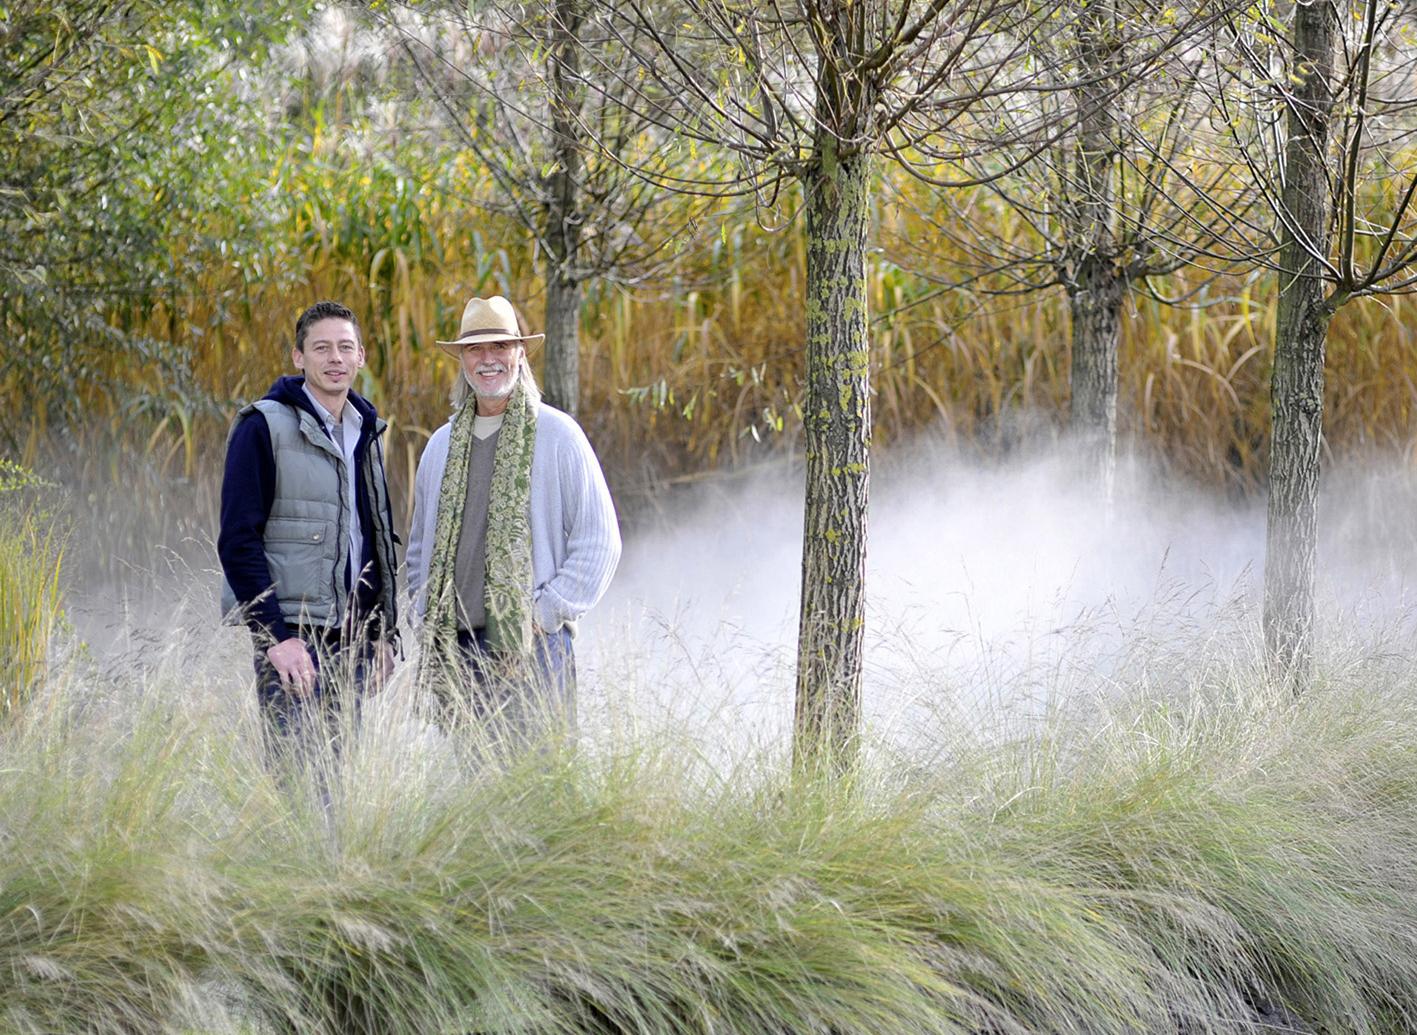 Galerie peter janke gartenkonzepte for Peter janke design mit pflanzen